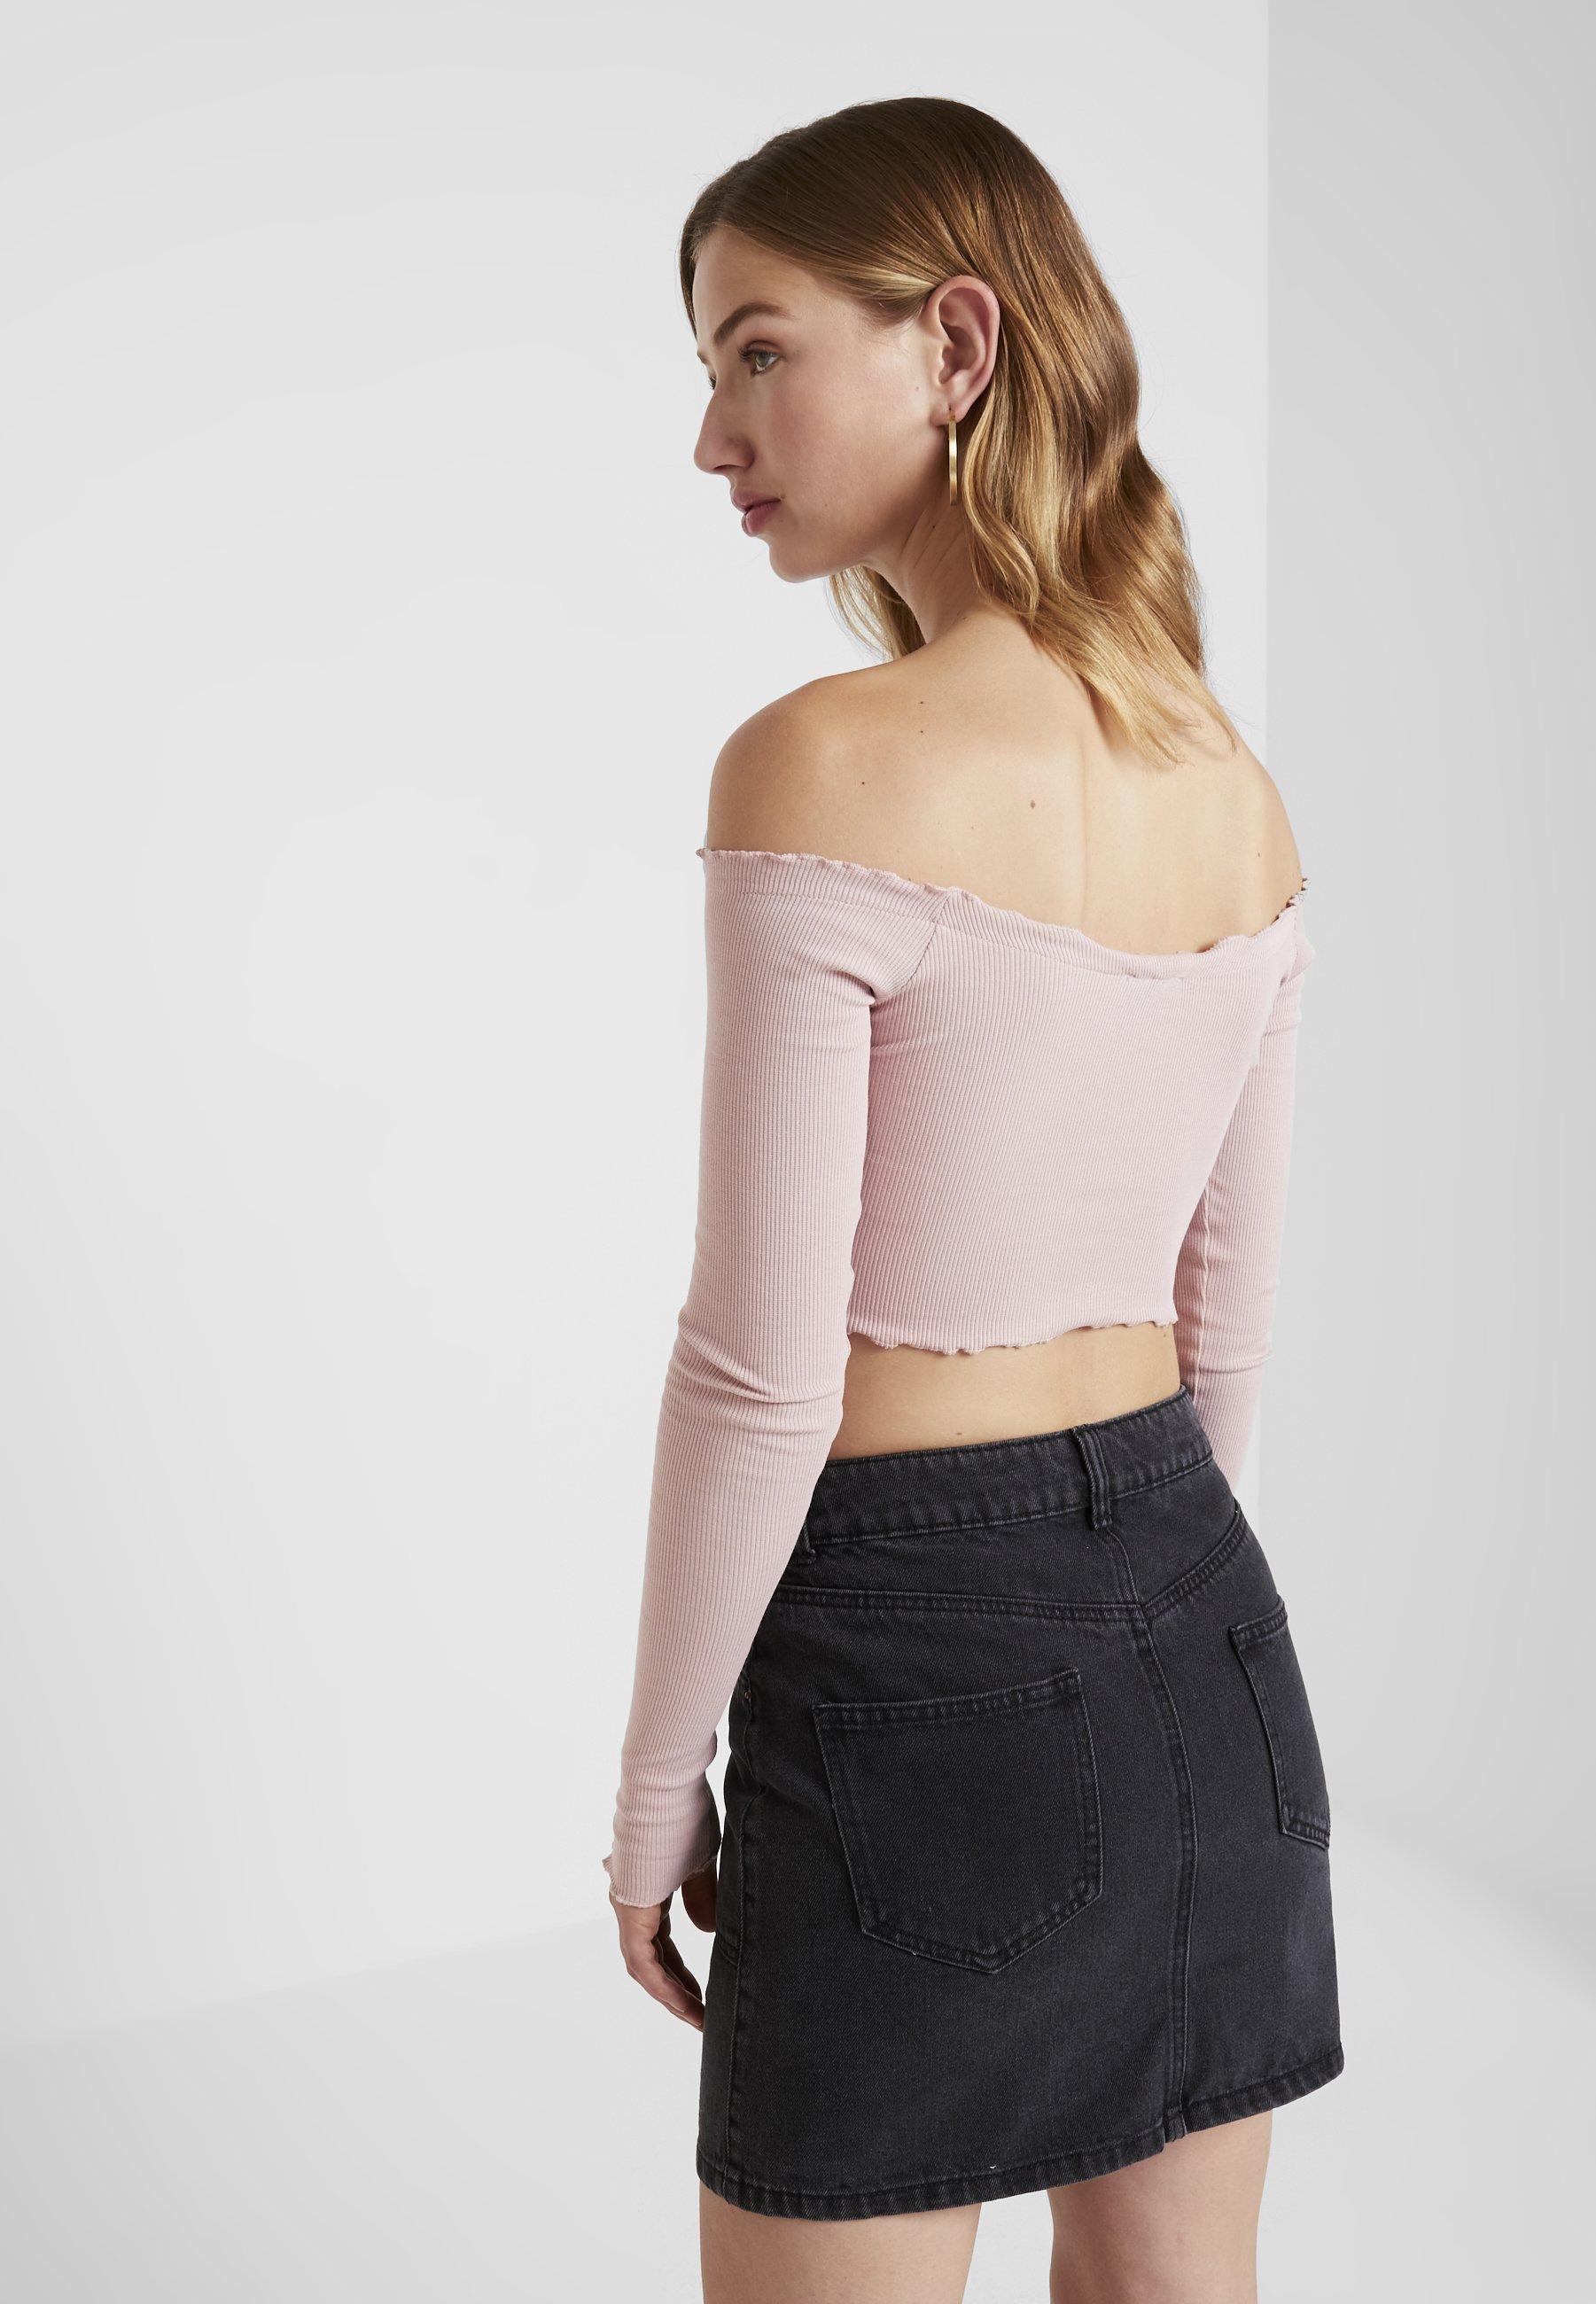 Na Talisa kd Sleeve CropT À Manches shirt Longues Pink Long 1JFcTlK